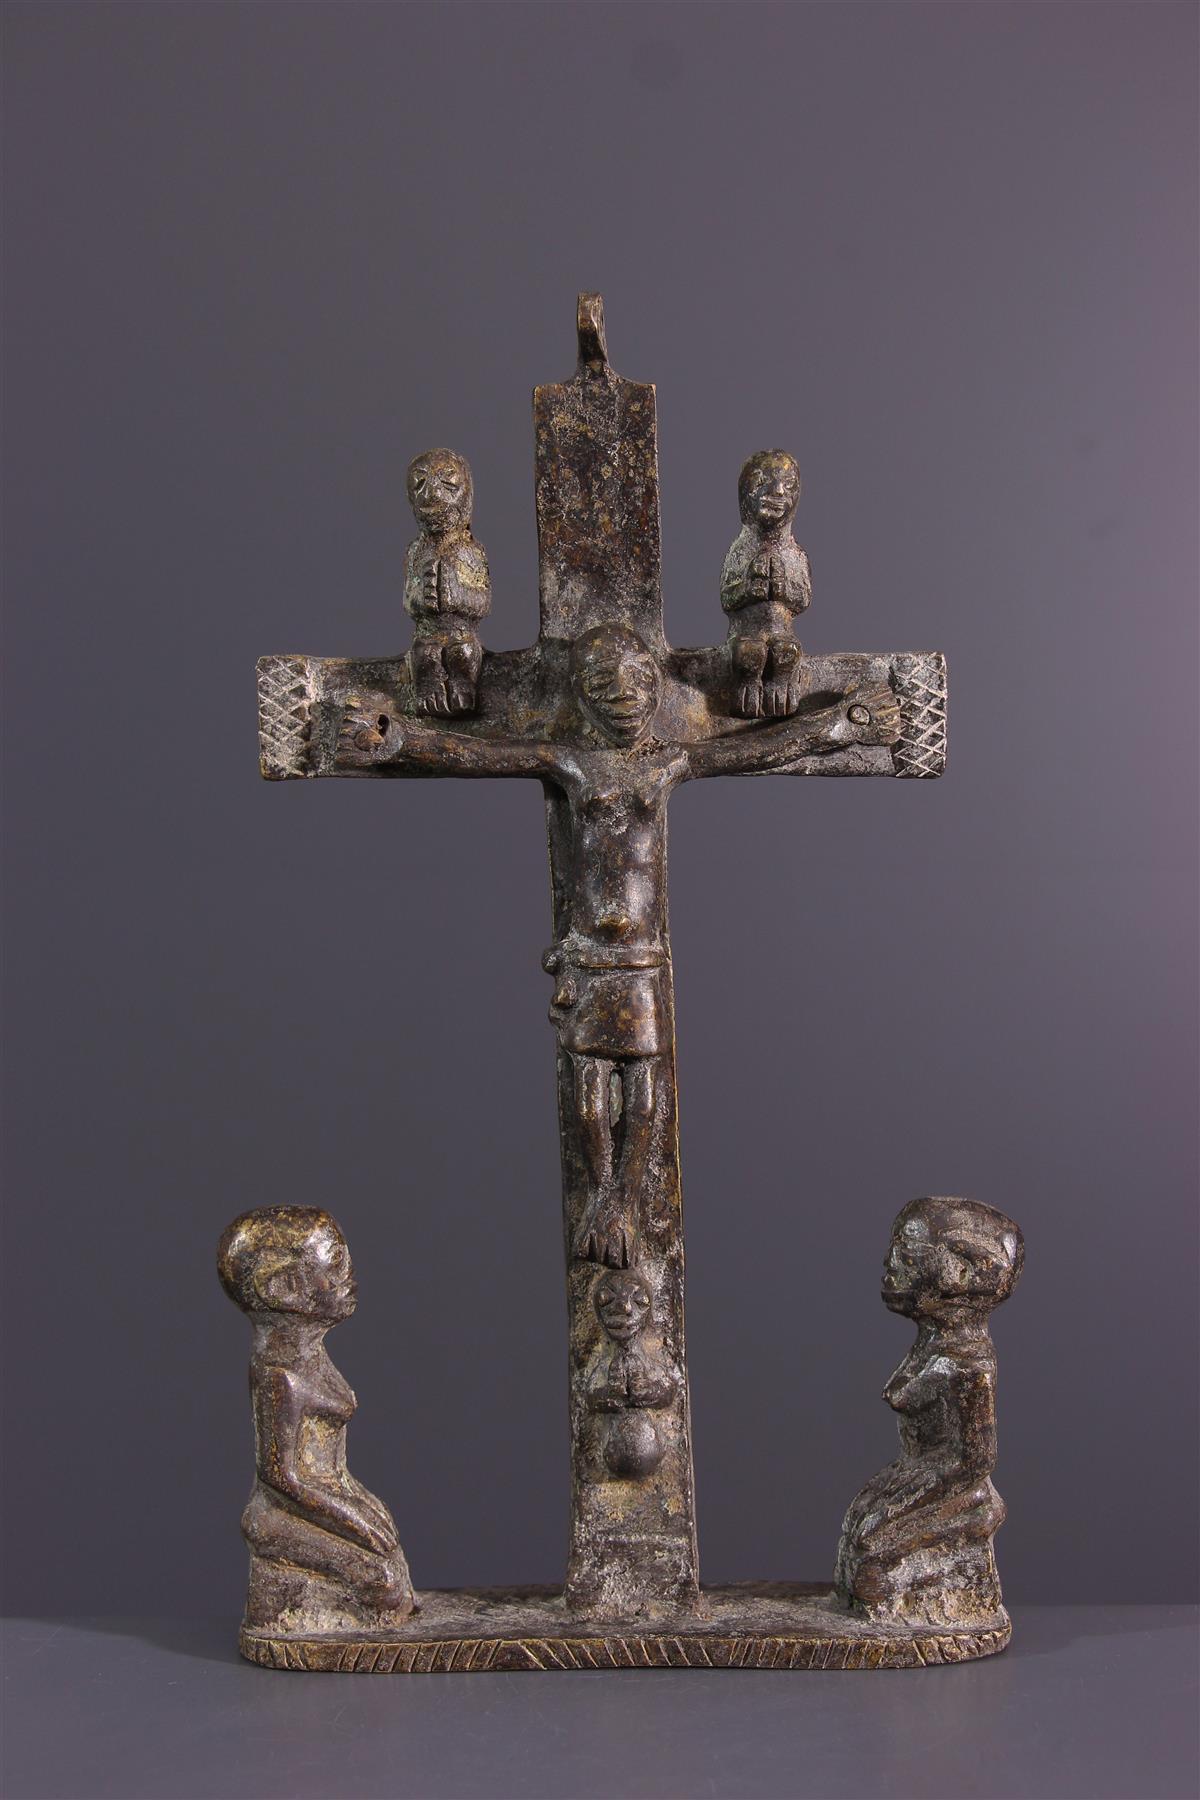 Kongo Crucifix - Tribal art